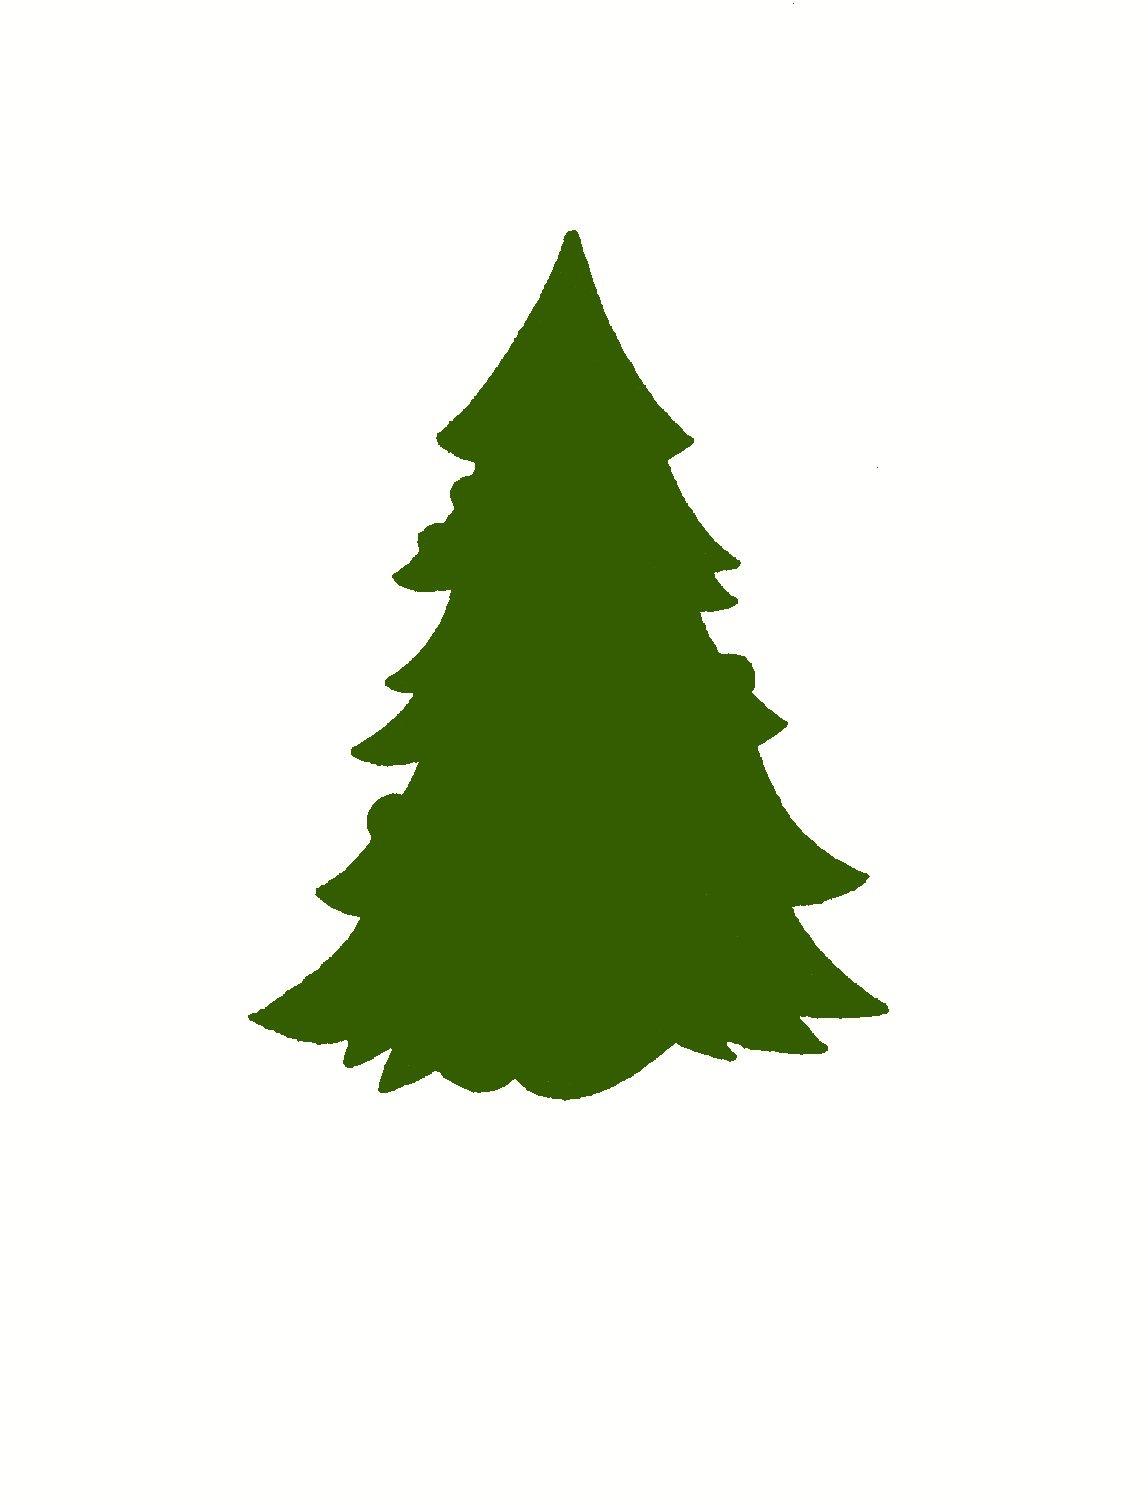 1148x1505 Christmas Tree Silhouette Clipart